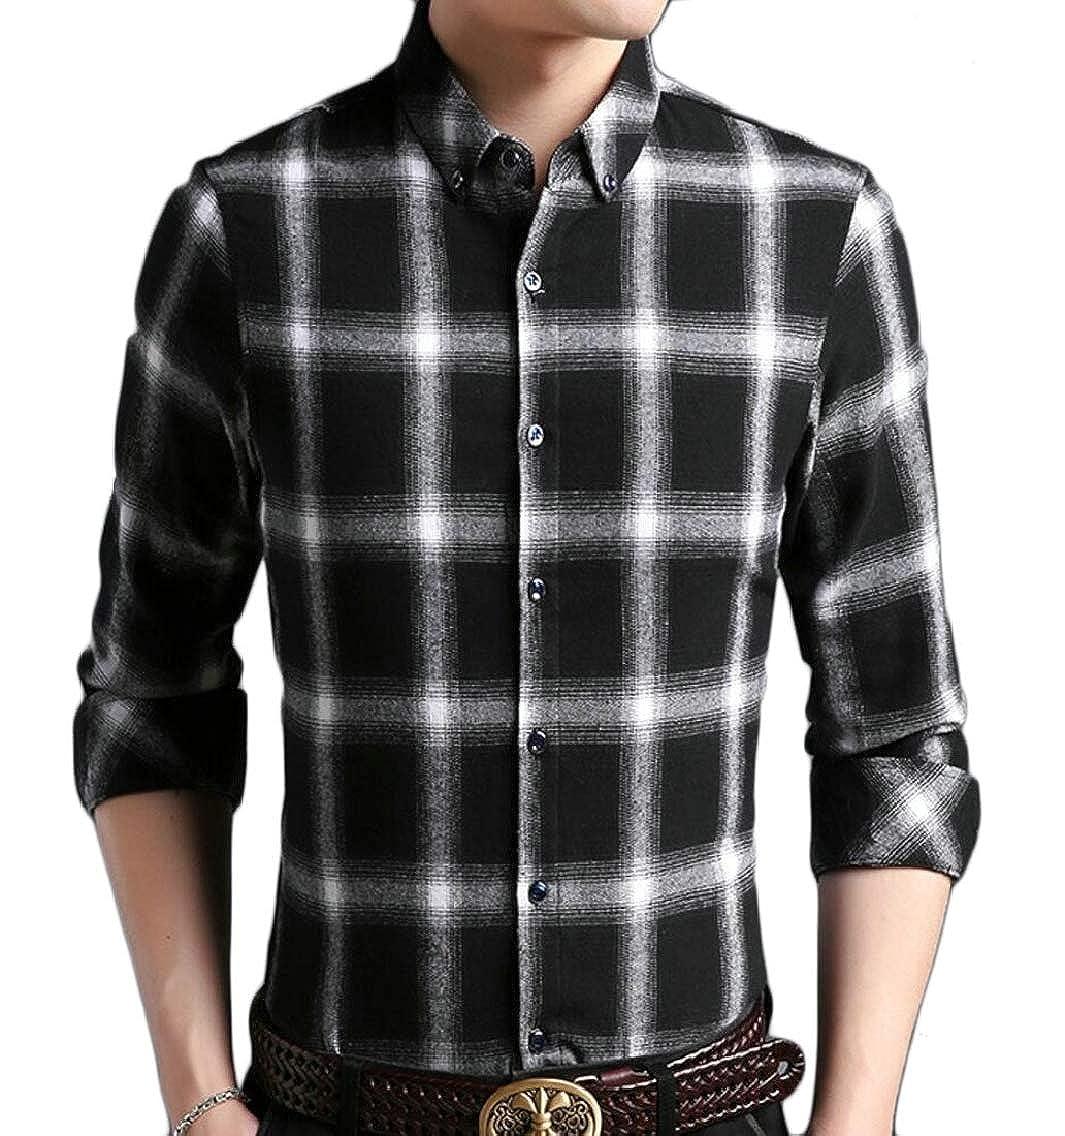 Jmwss QD Mens Basic Slim Fit Long Sleeve Plaid Checked Shirts Button Down Shirts